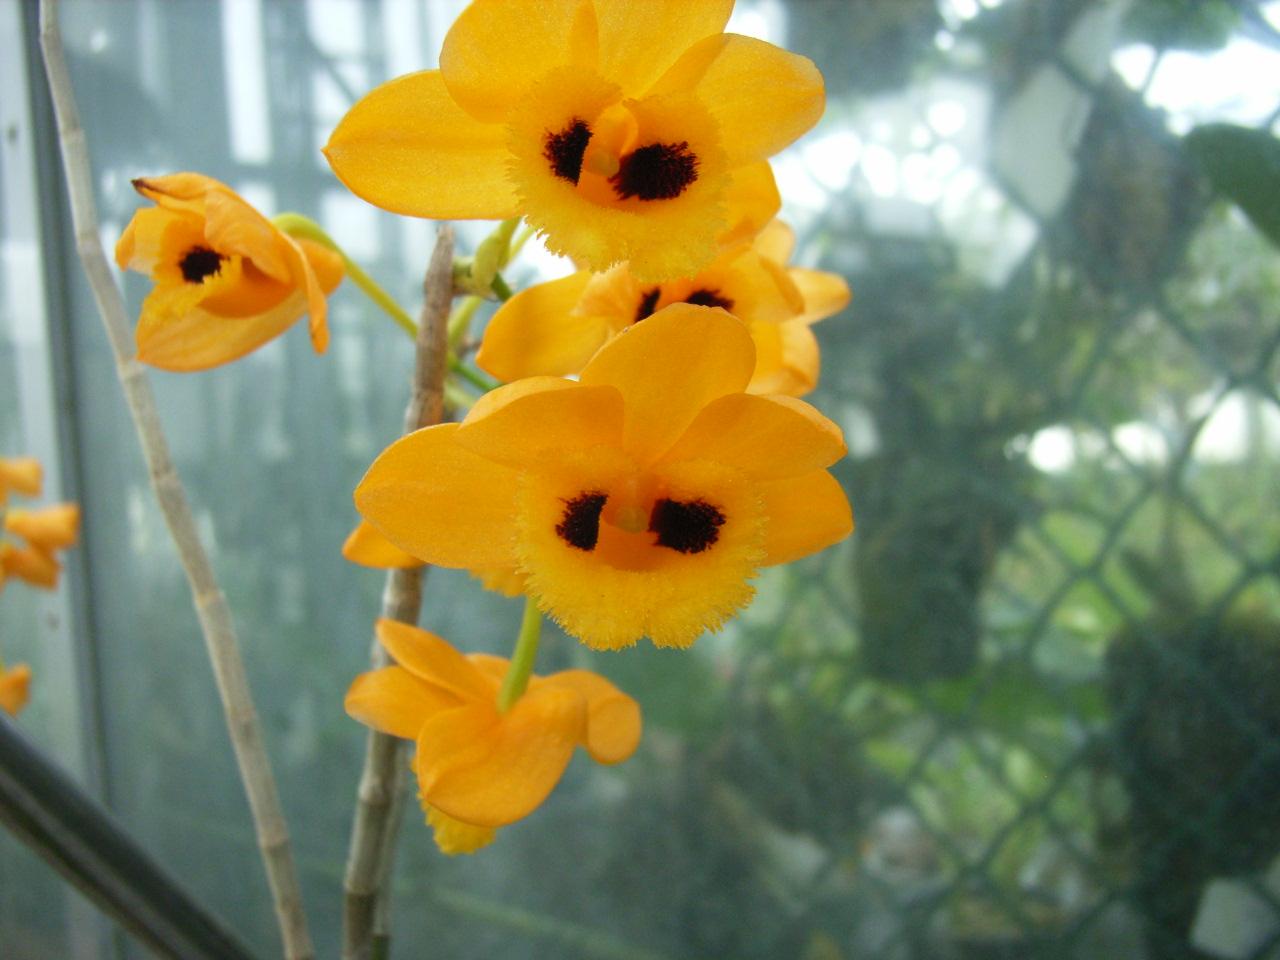 http://orchids.la.coocan.jp/Dendrobium/Dendrobium%20gibsonii/R0062450.JPG